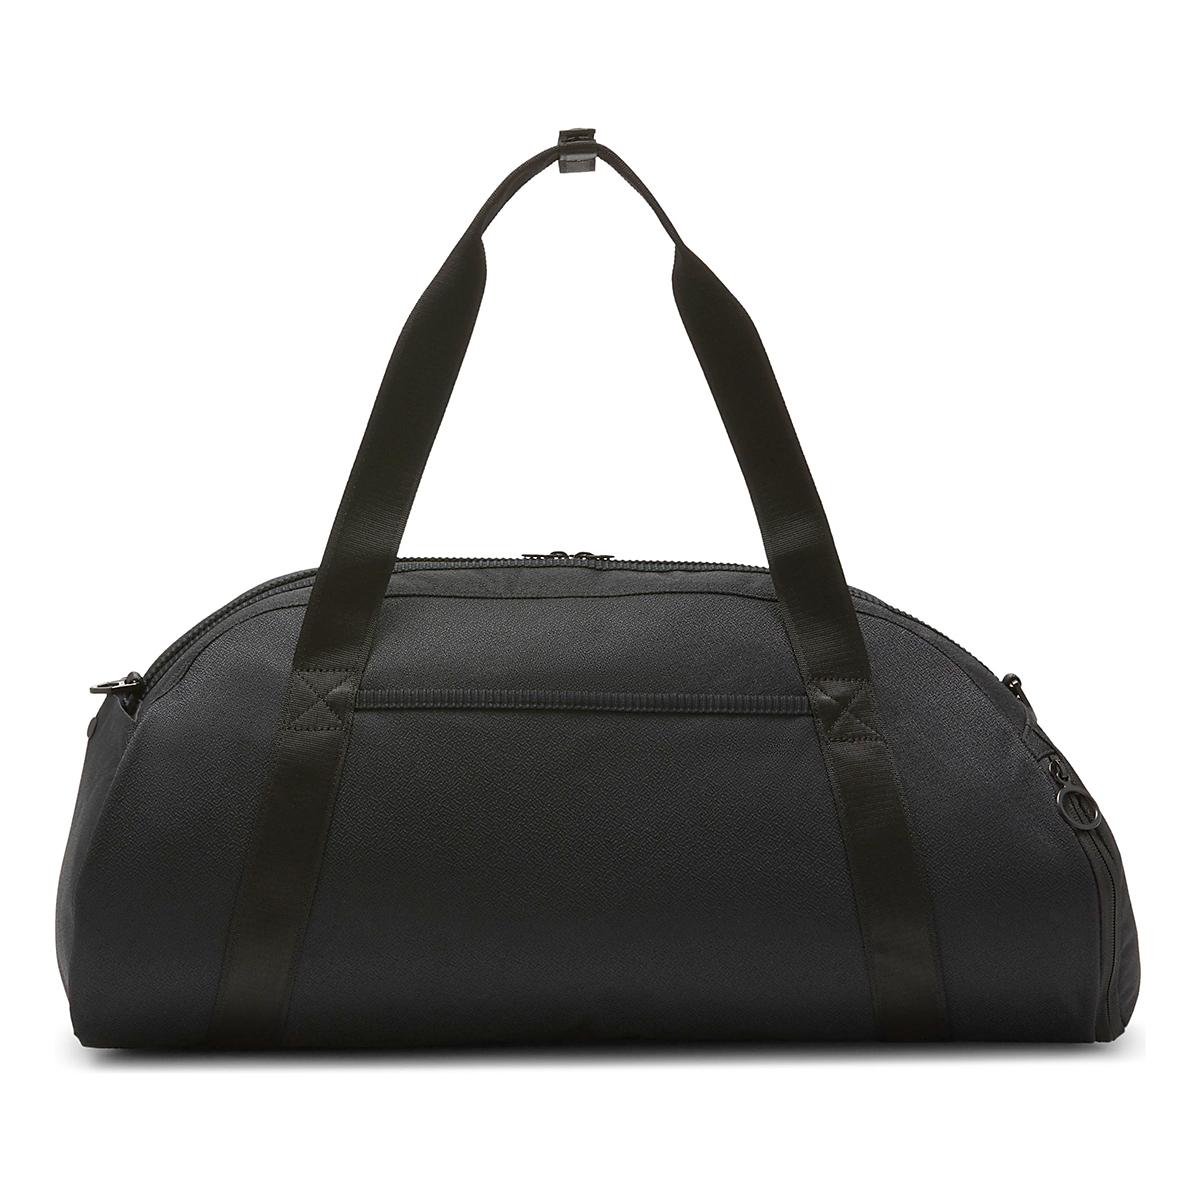 Women's Nike One Club Duffel Bag - Color: Black, Black, large, image 2